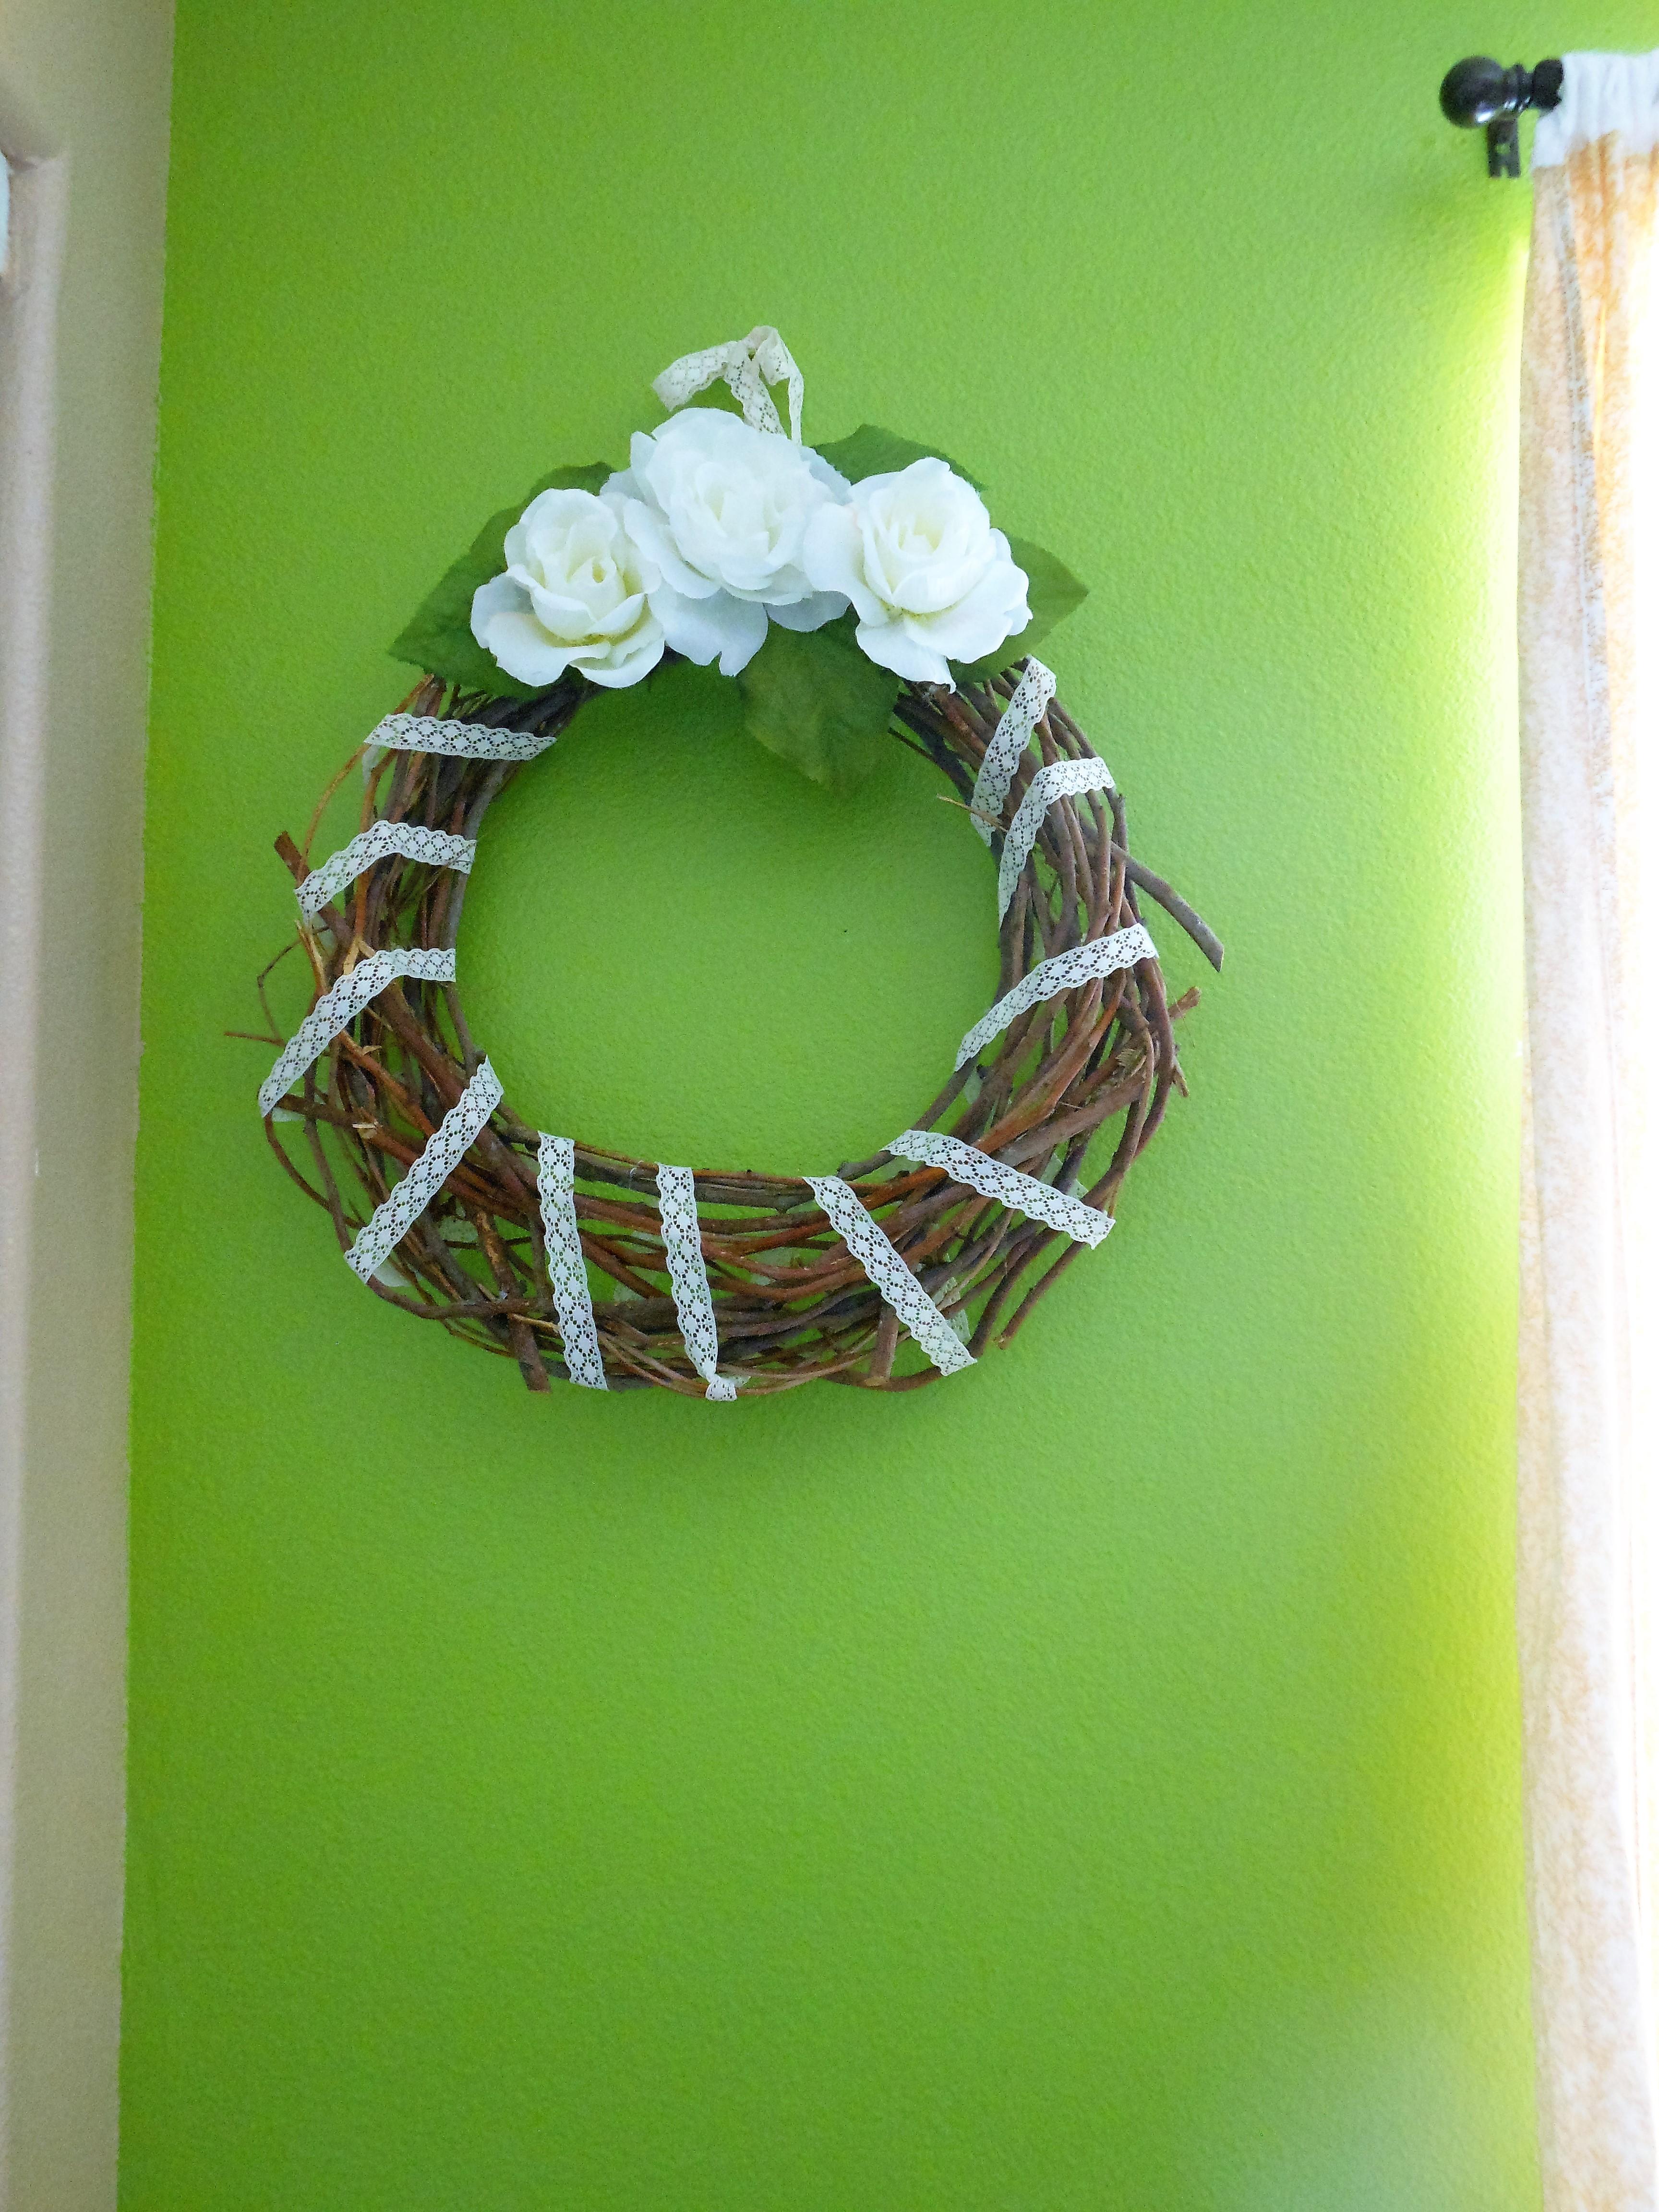 Hanging Wall Wreath